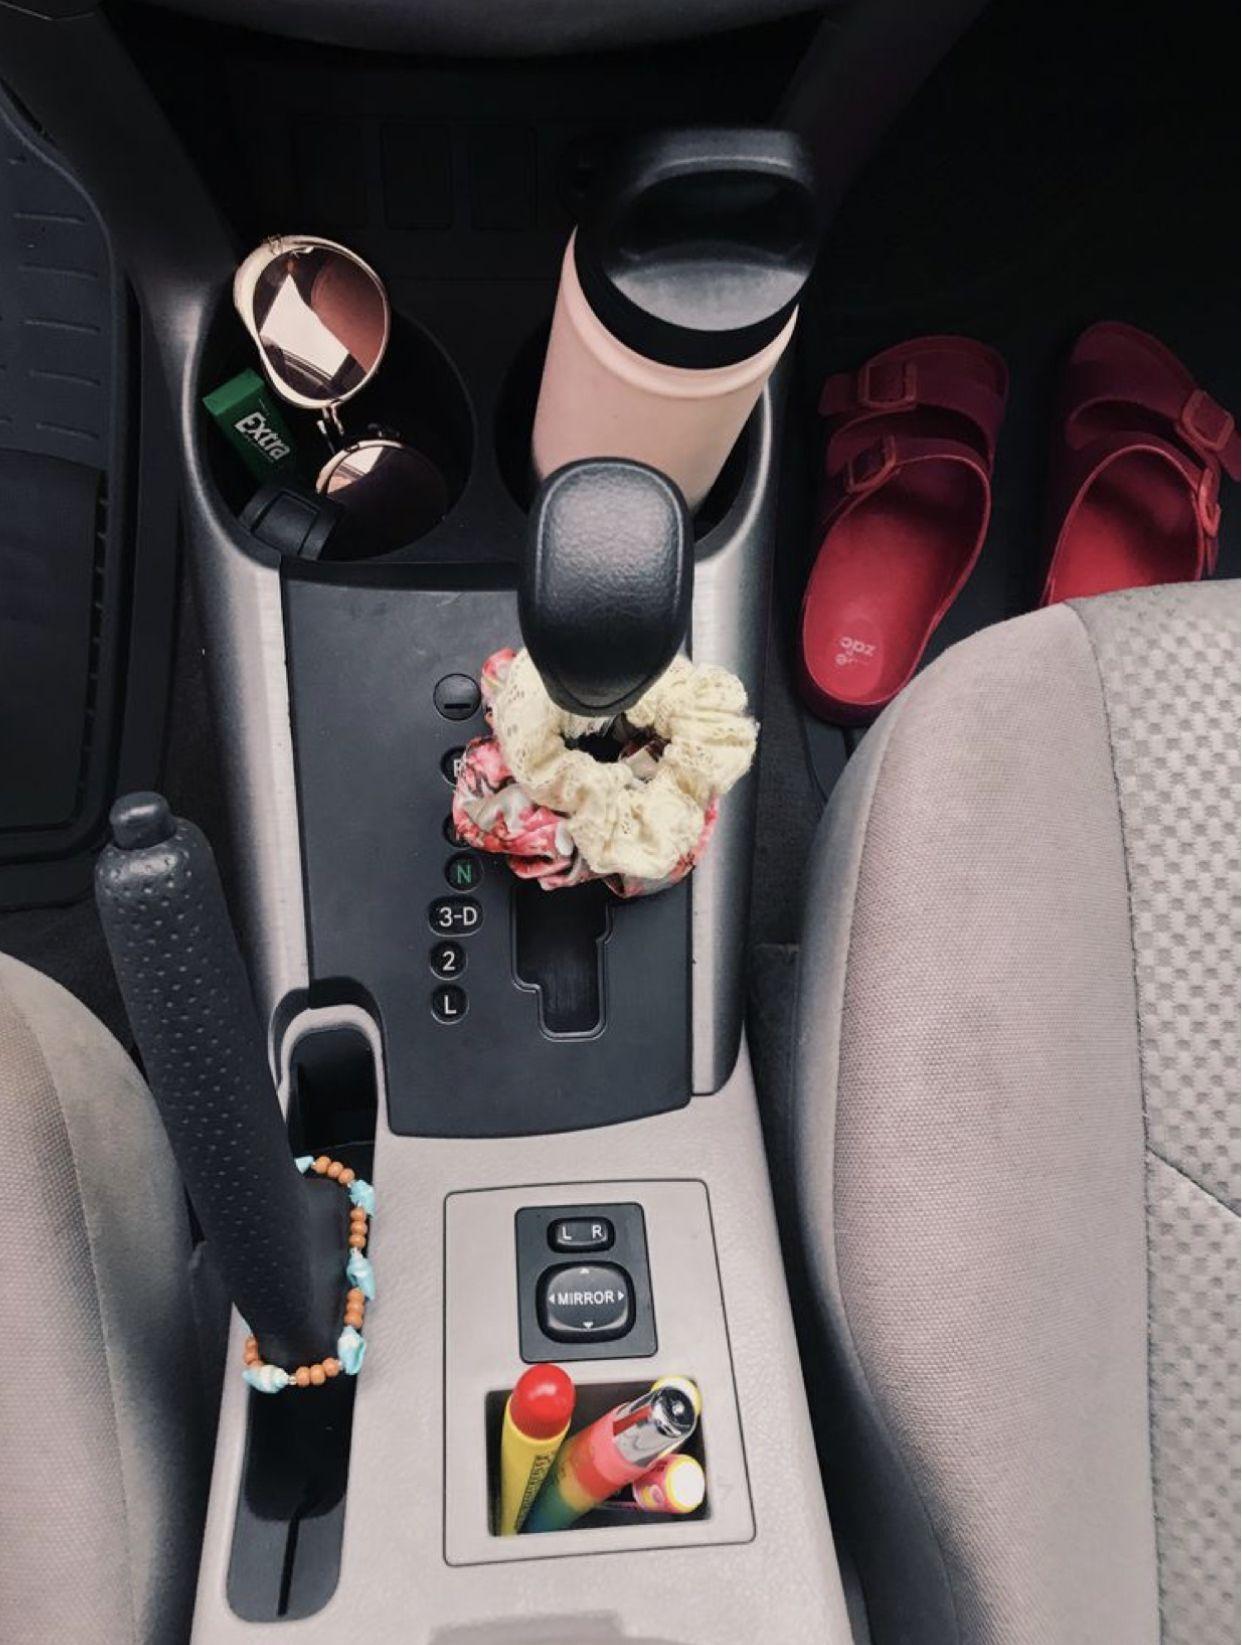 pinterest // ιѕåвєℓℓå ℓιåиg in 2020 Cute car accessories